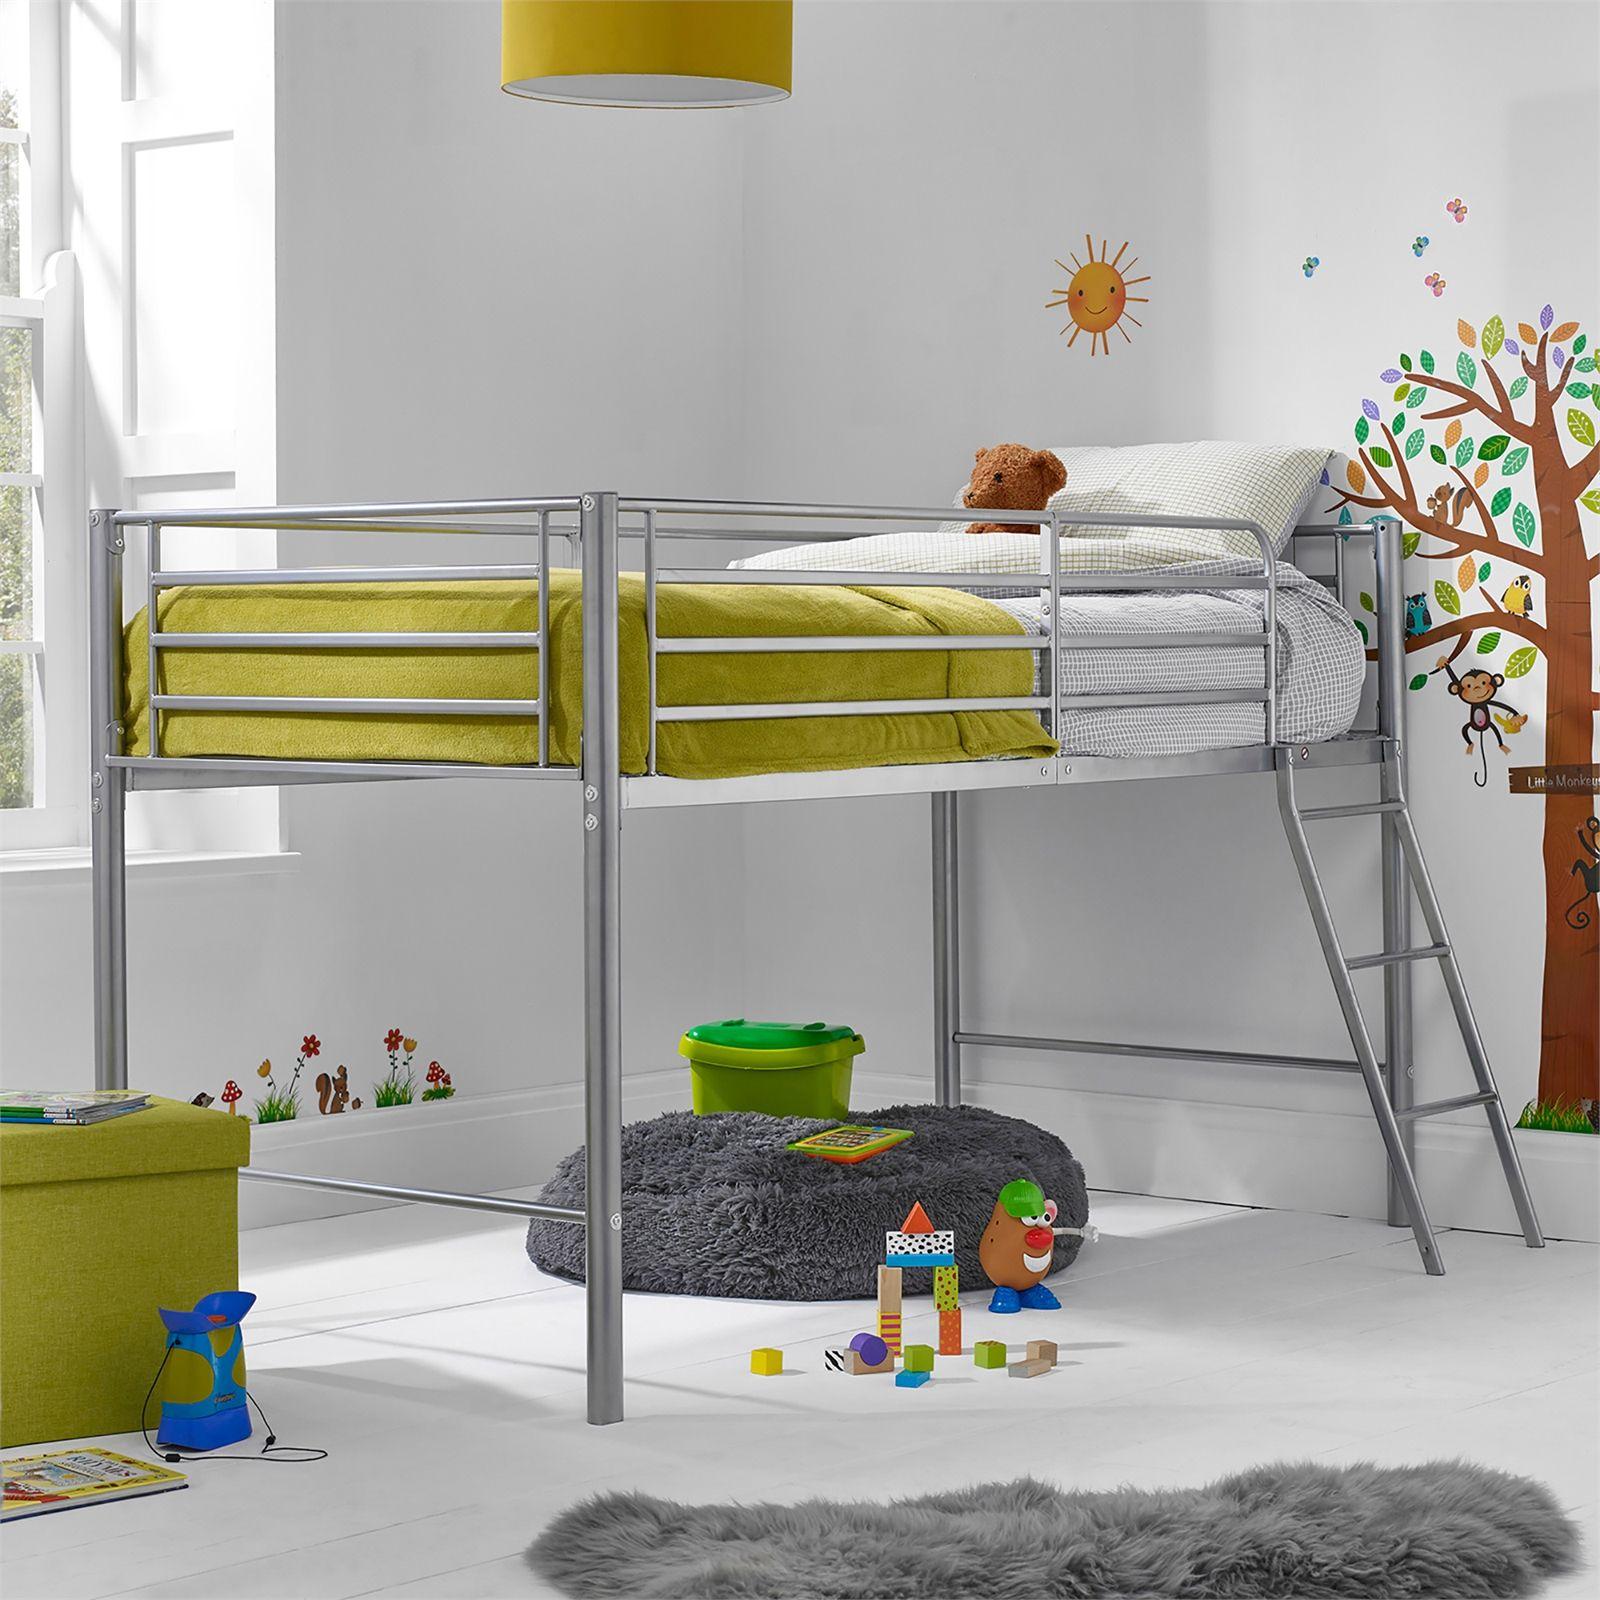 Saturn Mid Sleeper in 10  Kid beds, Kids wooden bed, Mid sleeper